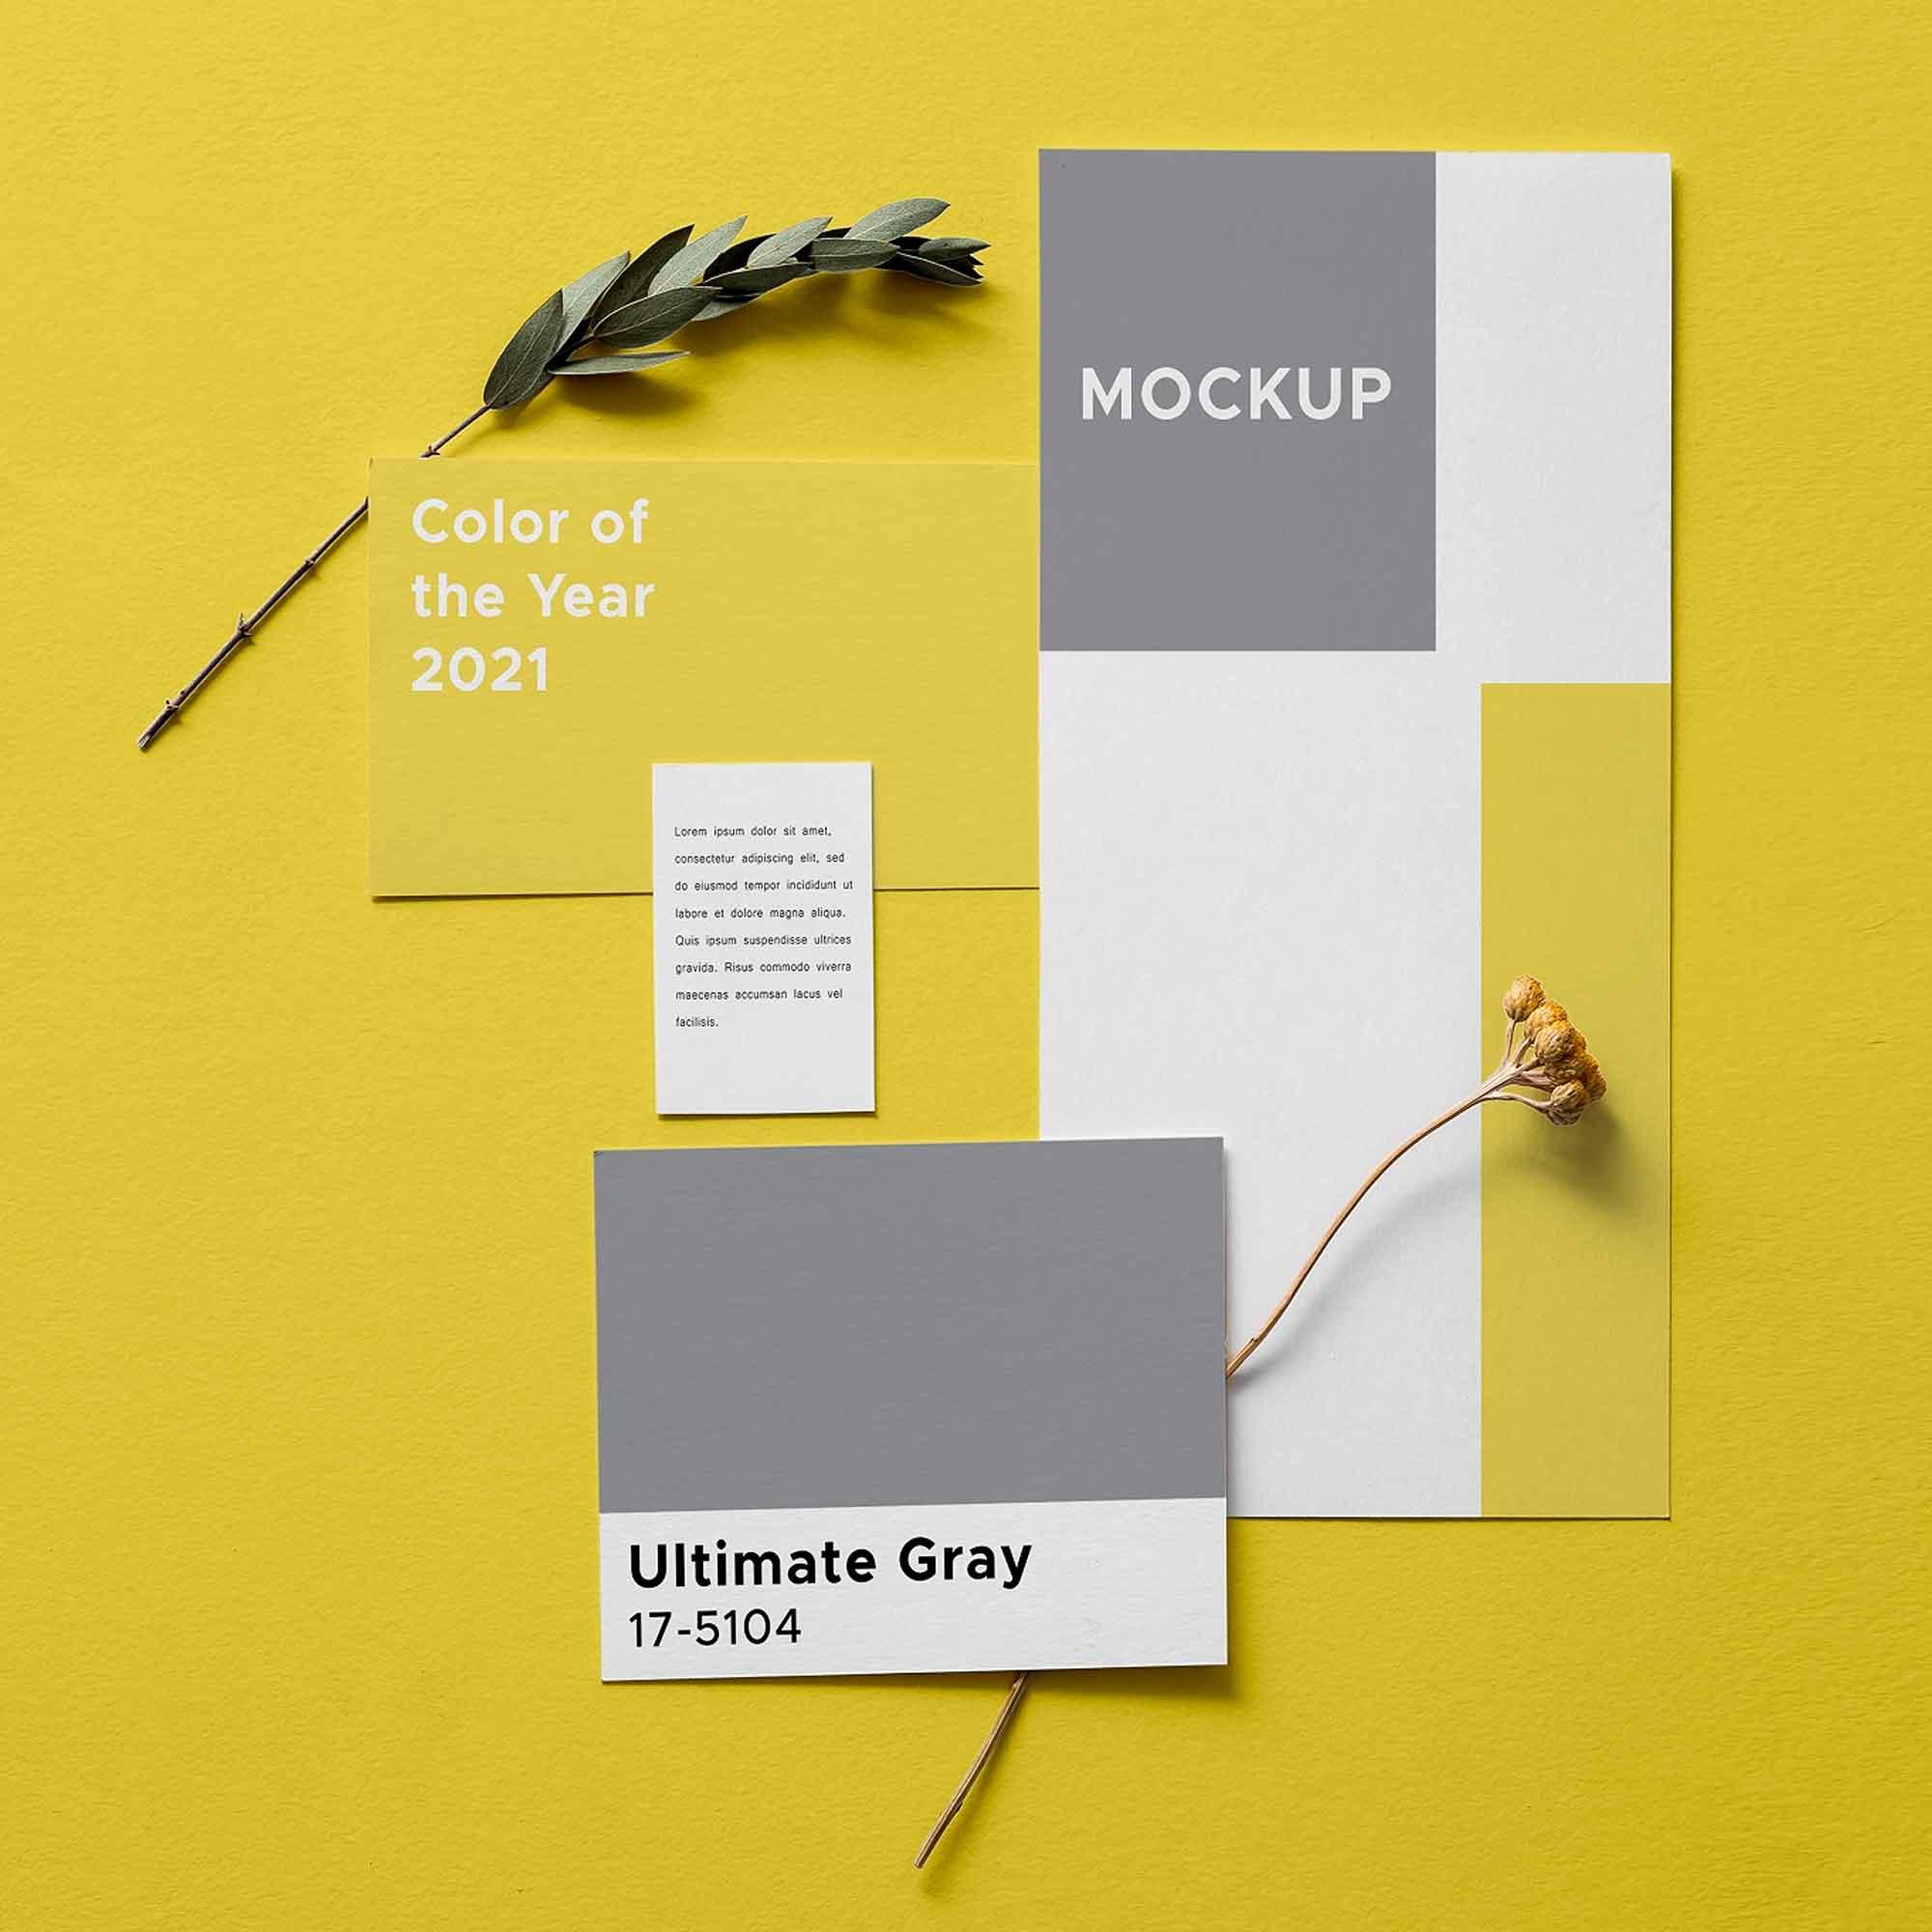 Illuminating Gray Card Branding Mockup 2